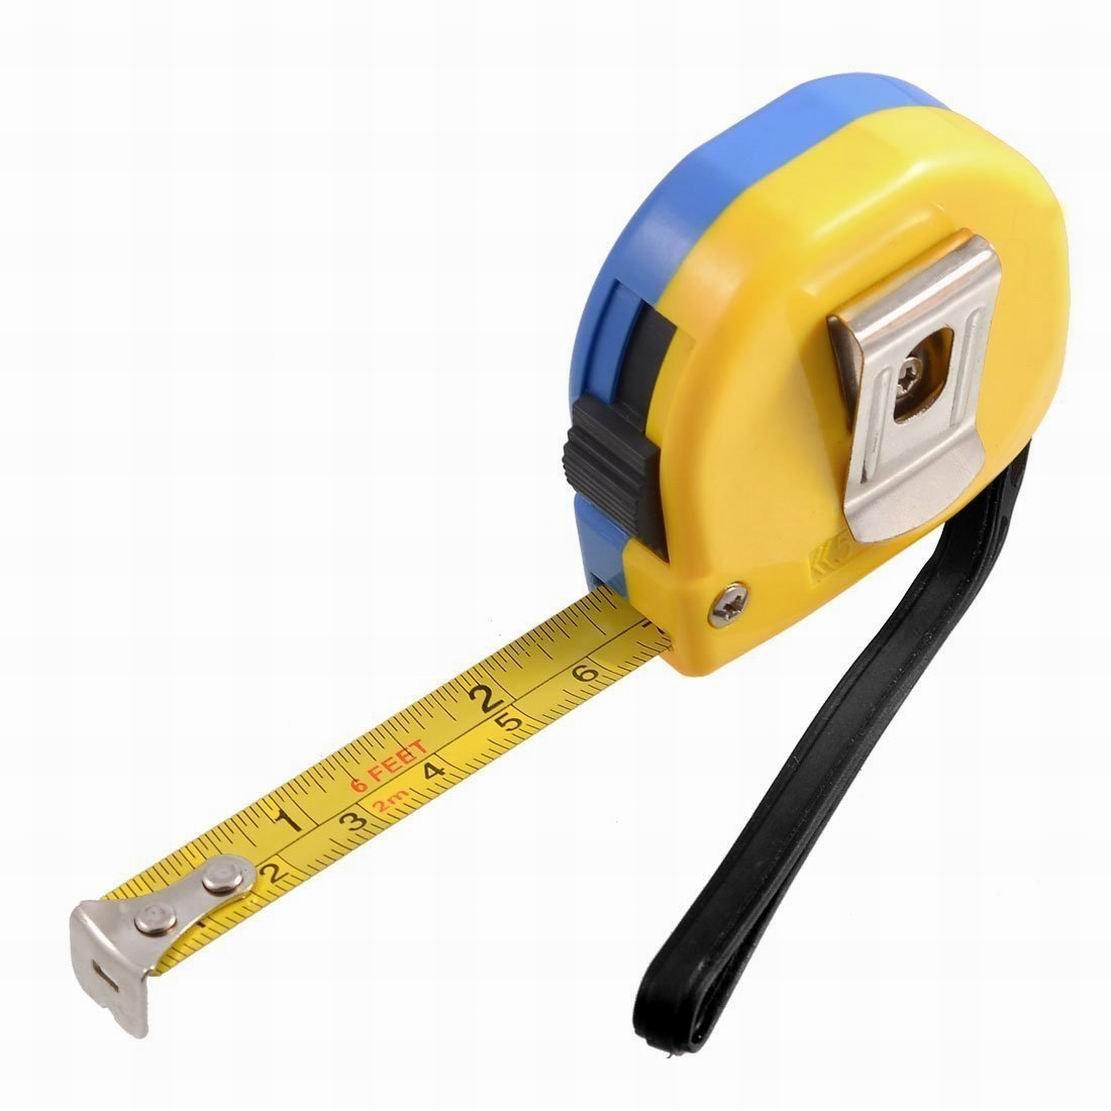 Uptell 2M 6Ft Retractable Metric English Ruler Tape Carpenter Measuring Tool